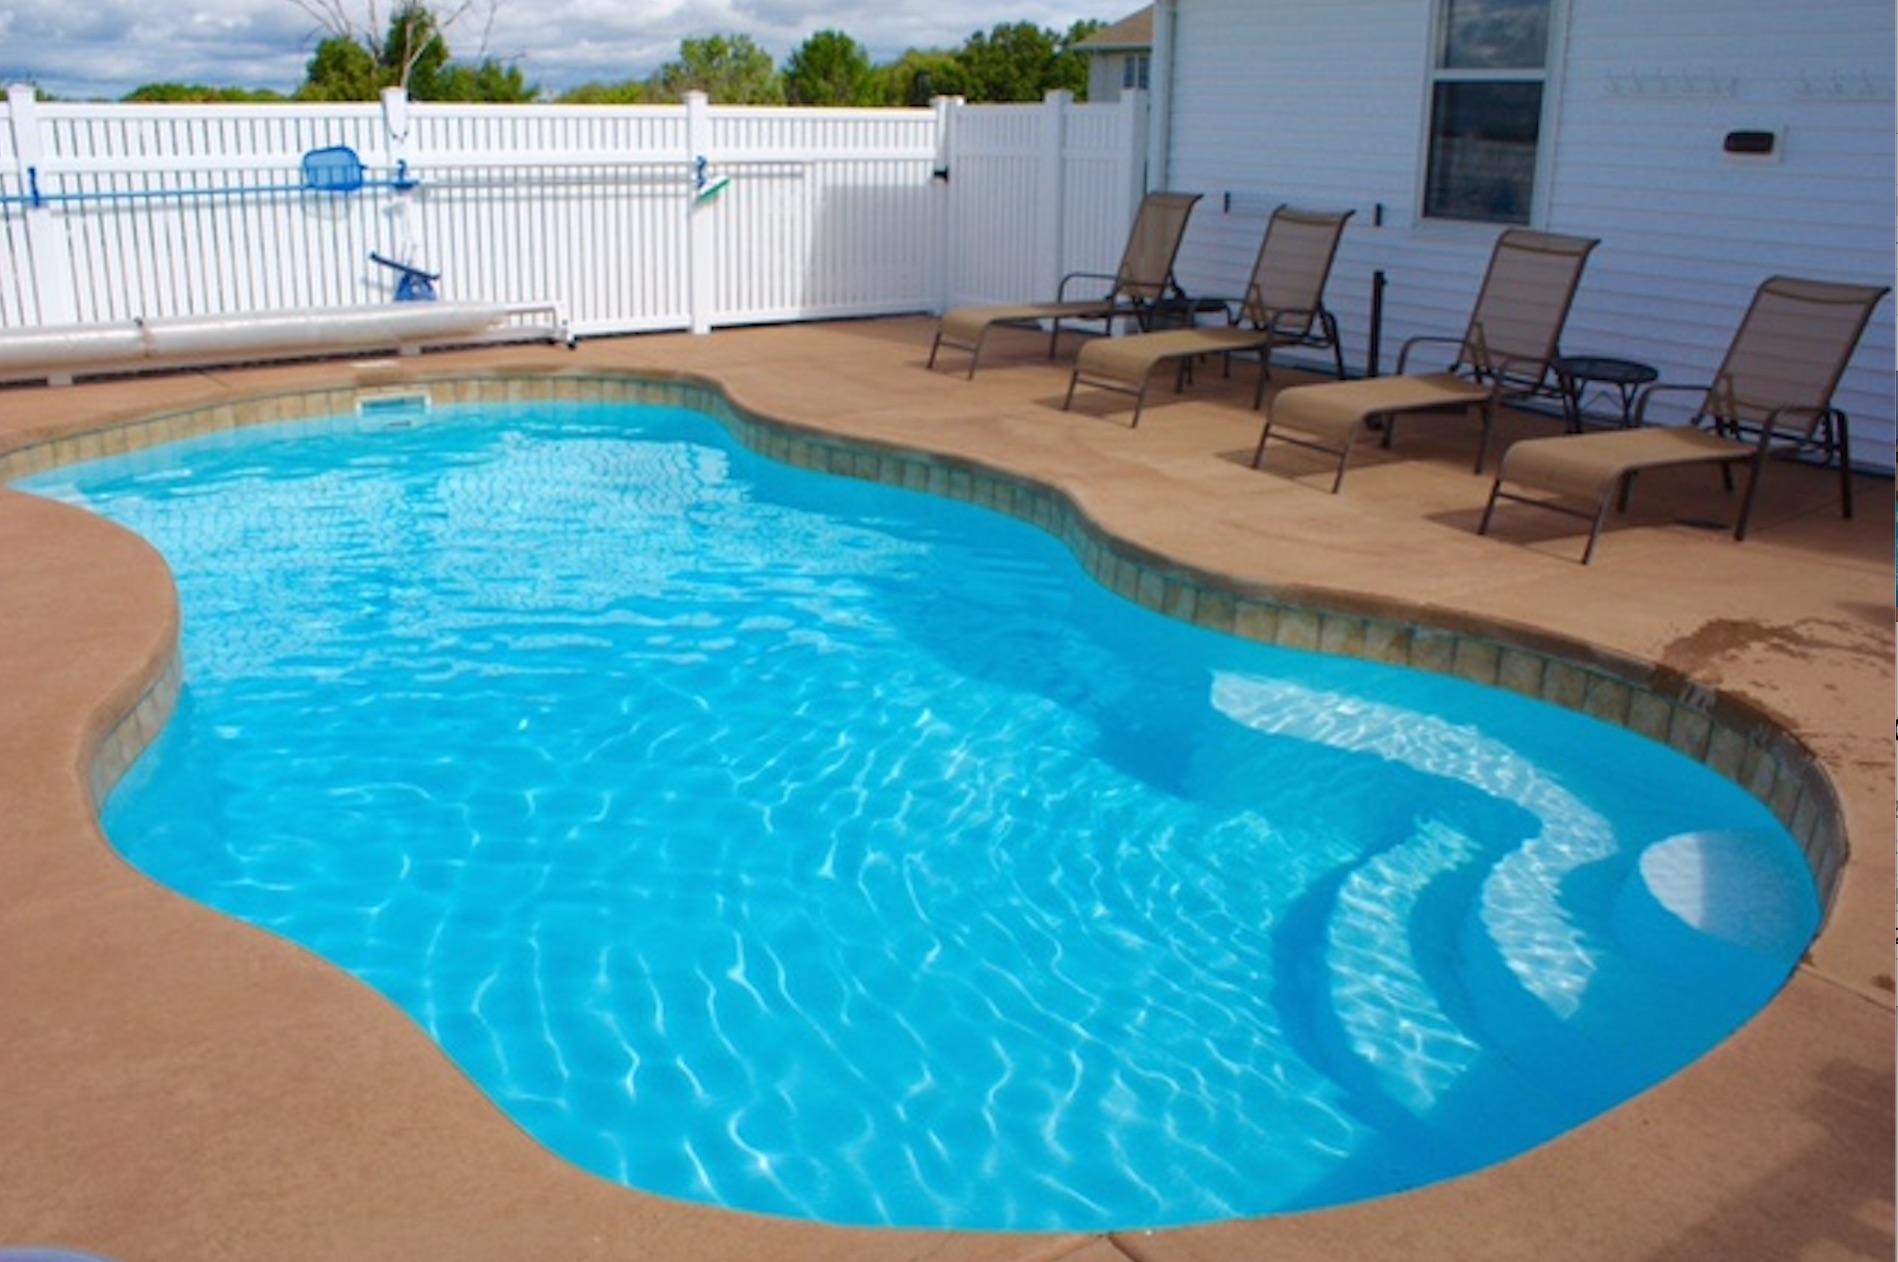 Pool shot from screenshot Novotny.jpg